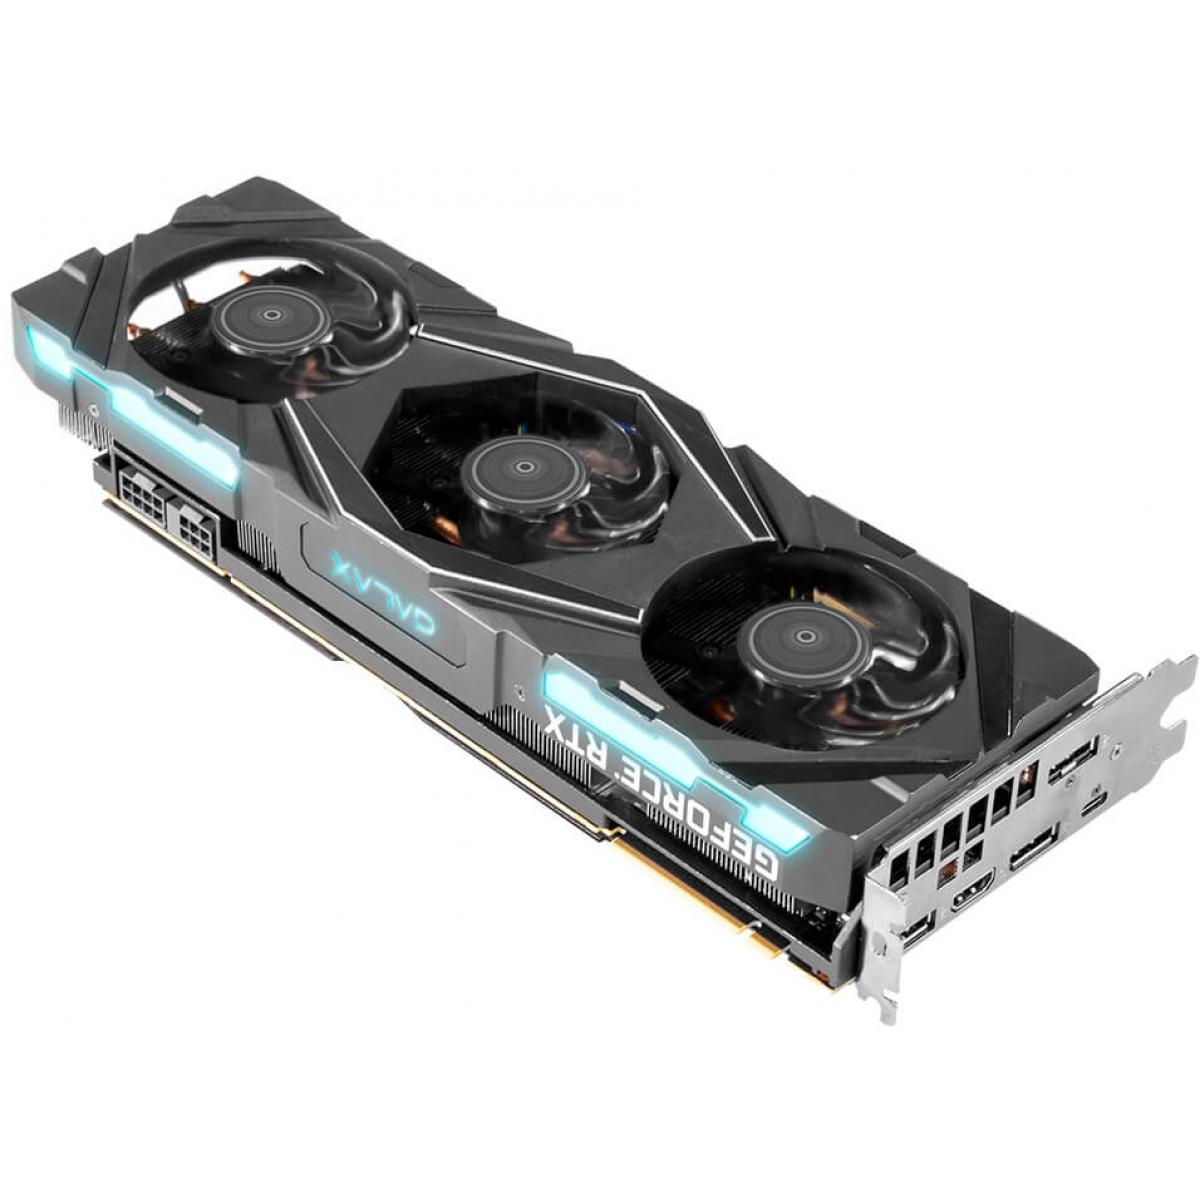 Placa de Vídeo Galax Geforce RTX 2080 SG, 8GB GDDR6, 28NSL6UCU1SE